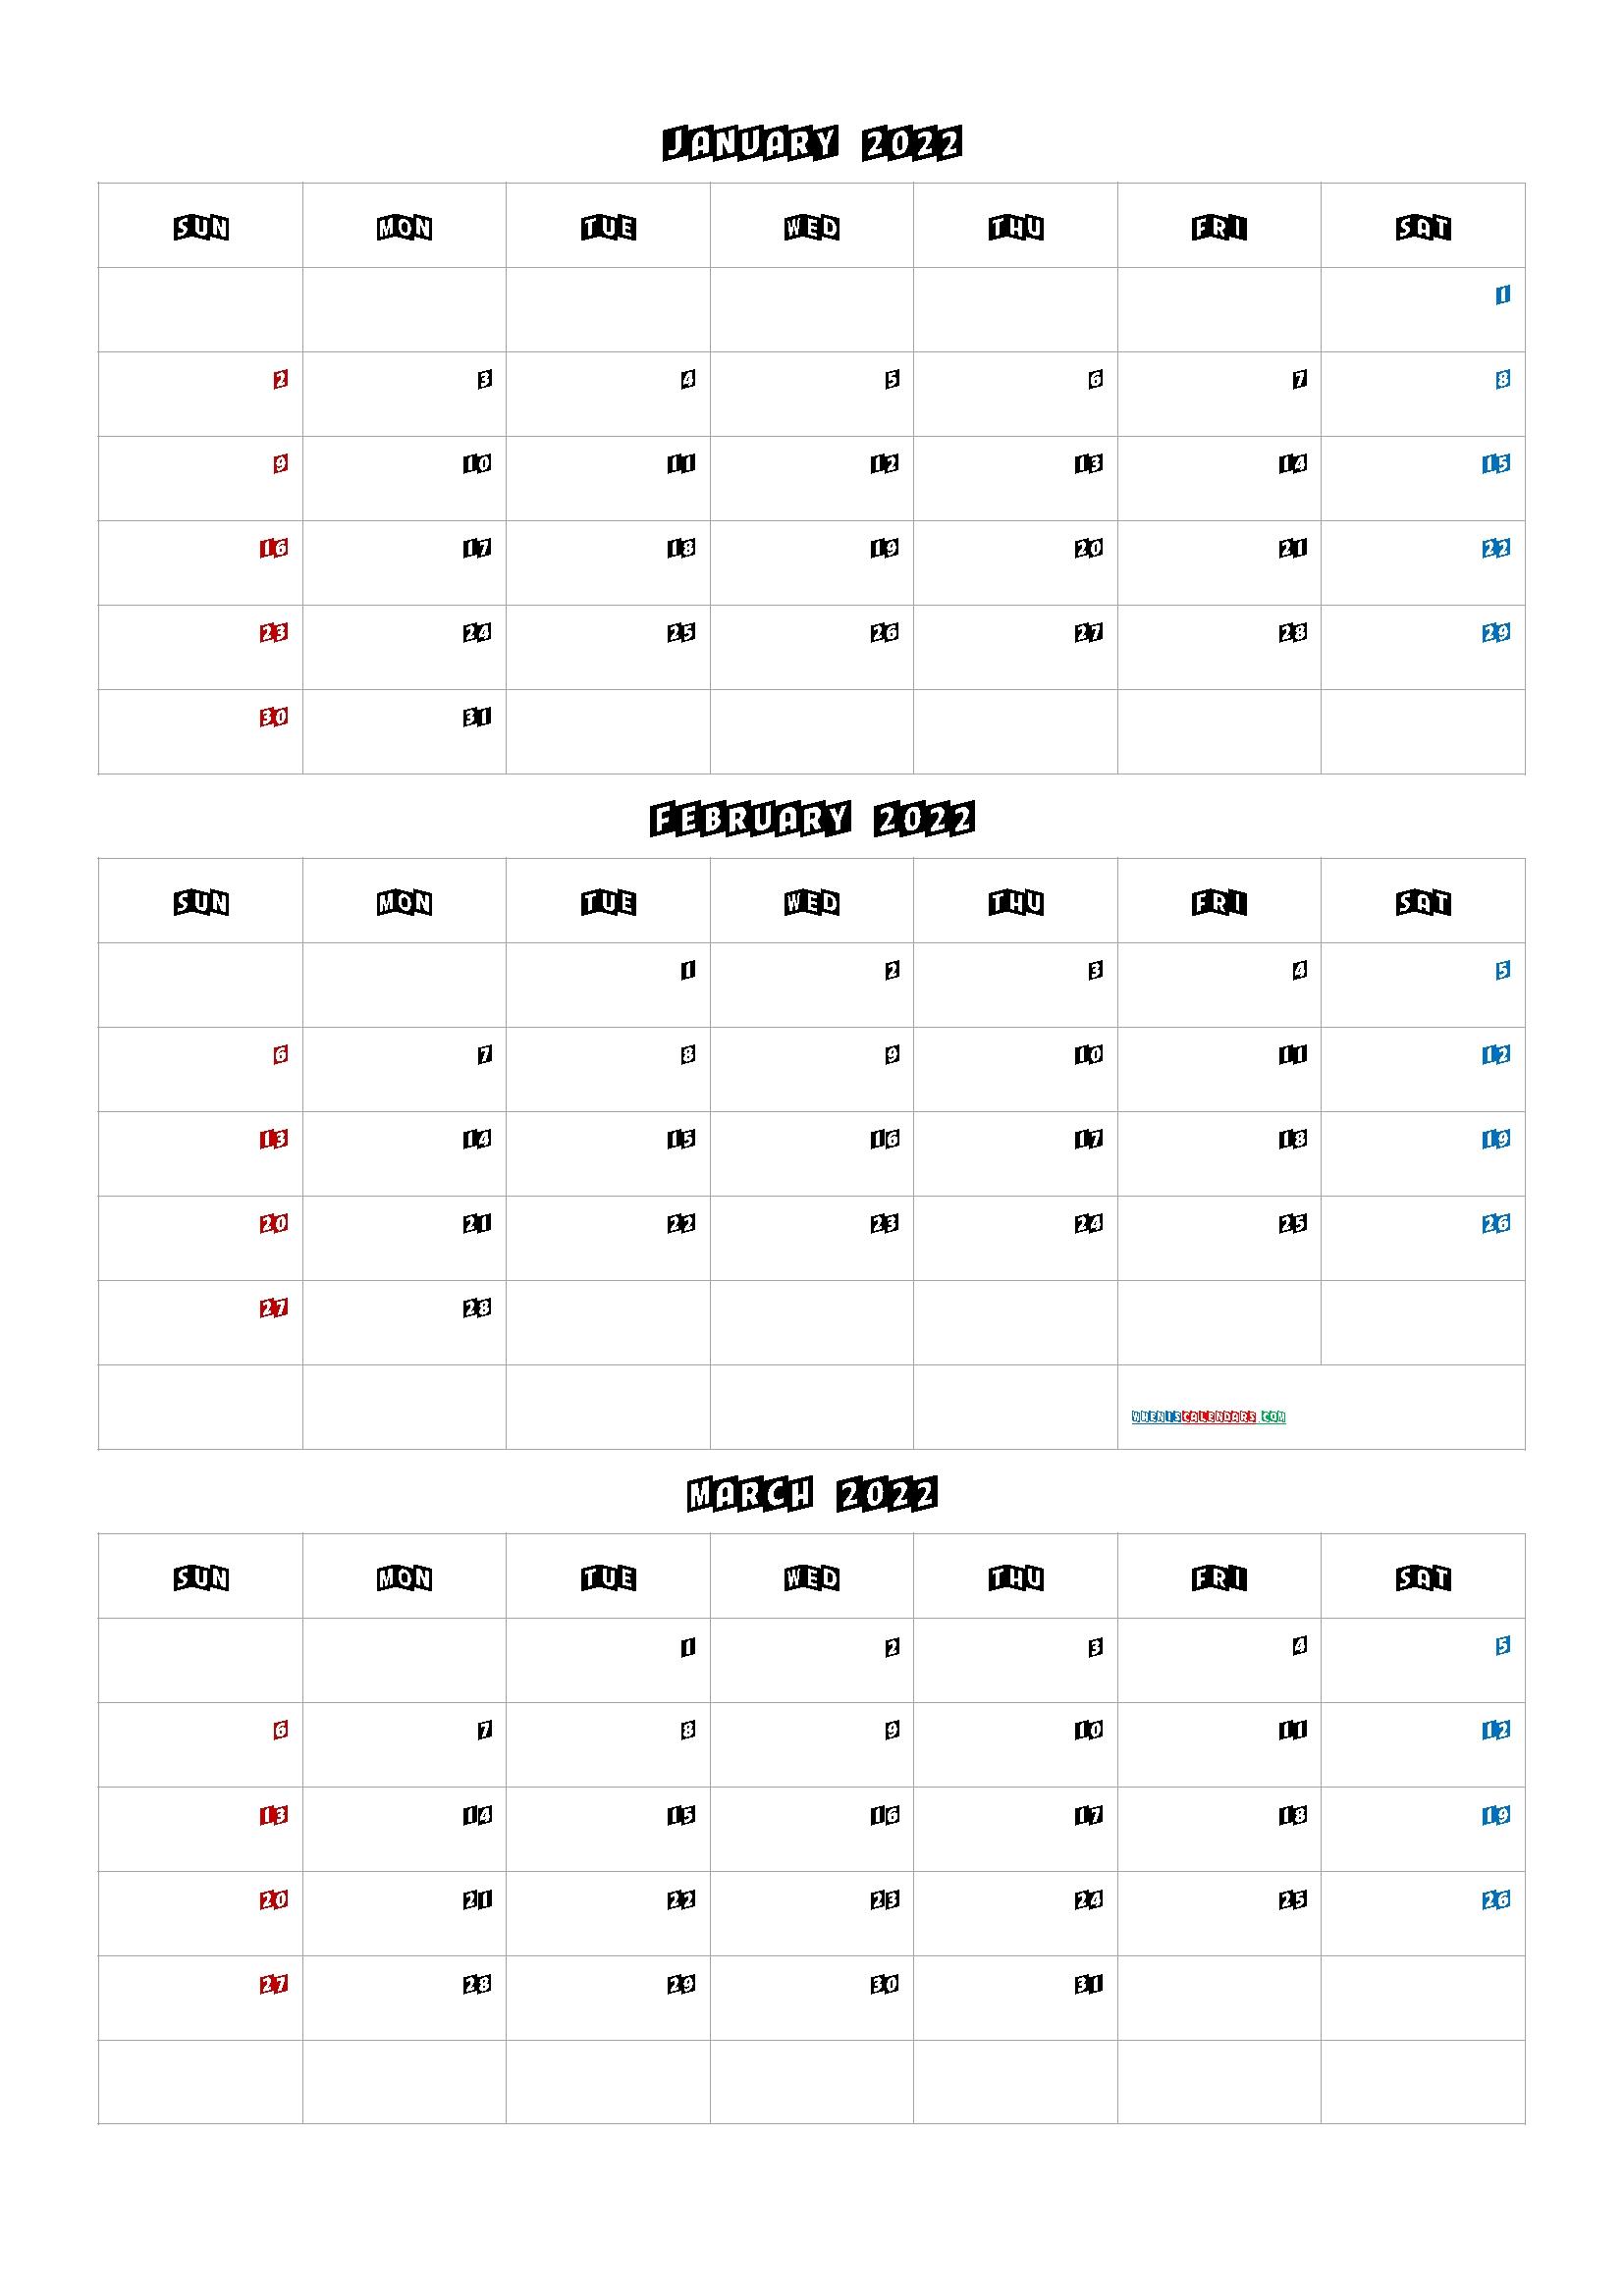 Free January February March 2022 Calendar [Q1-Q2-Q3-Q4 Q4 Calendar 2021